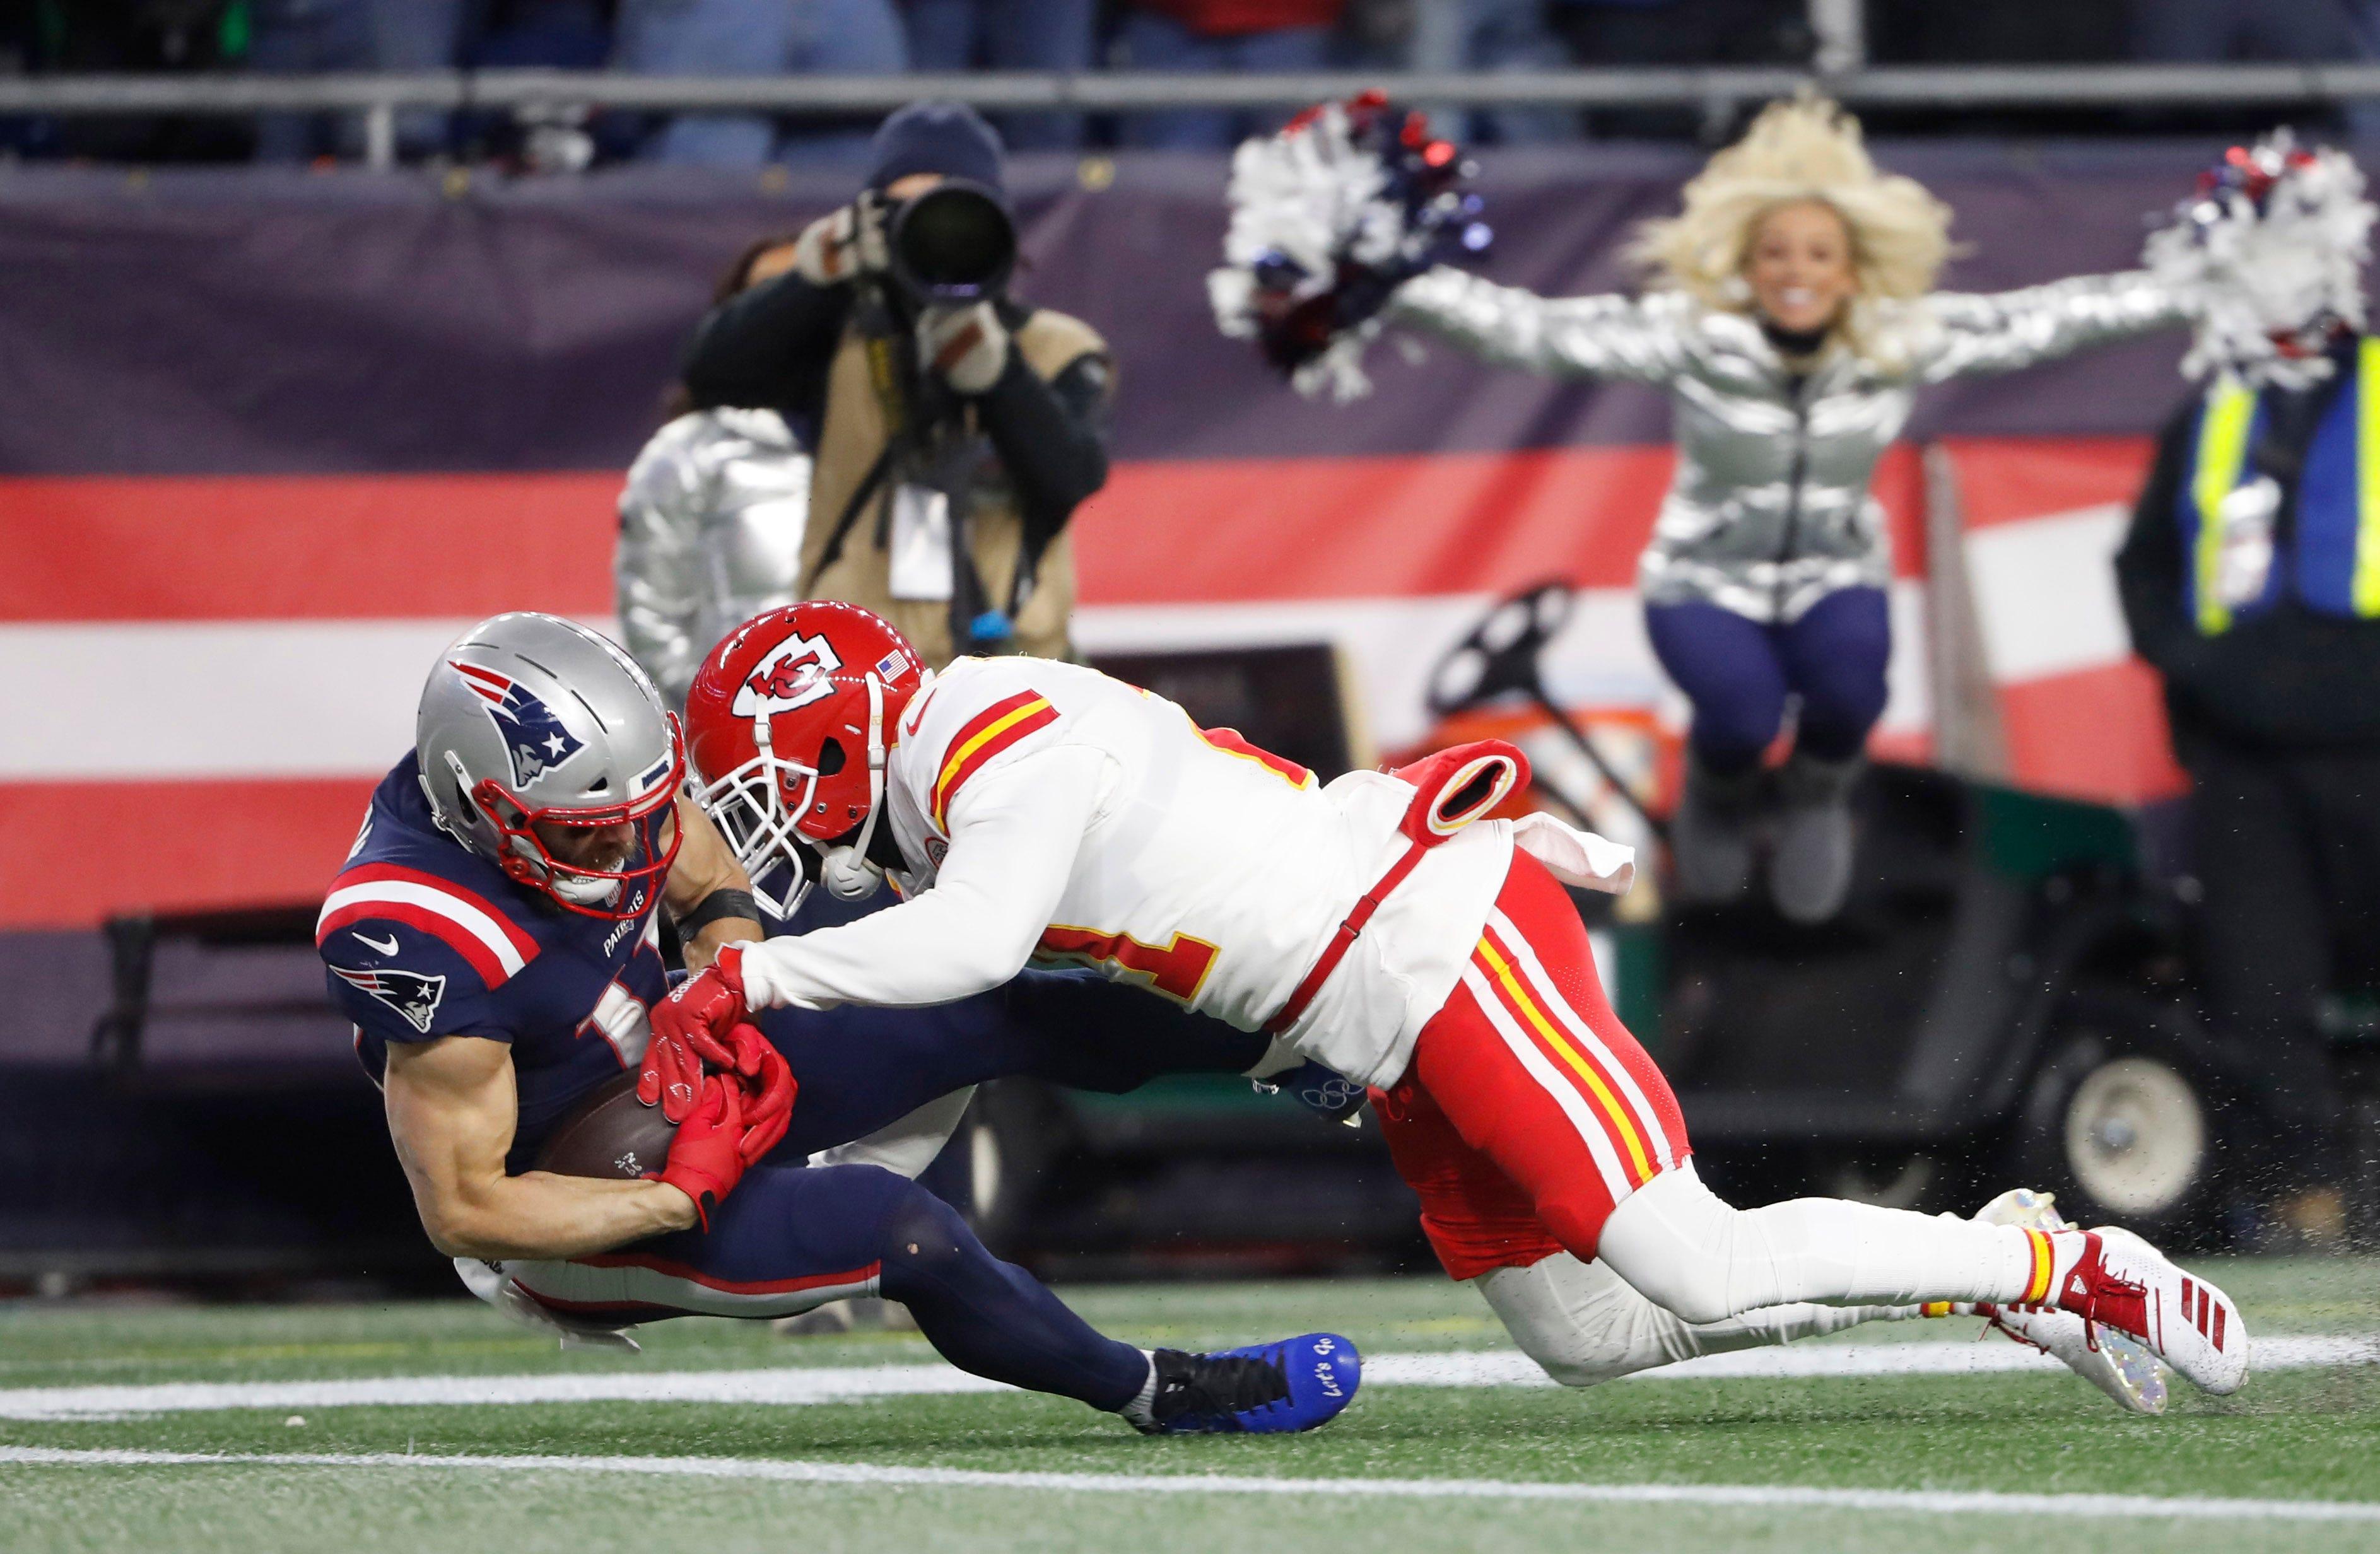 Best photos of the 2019 NFL season